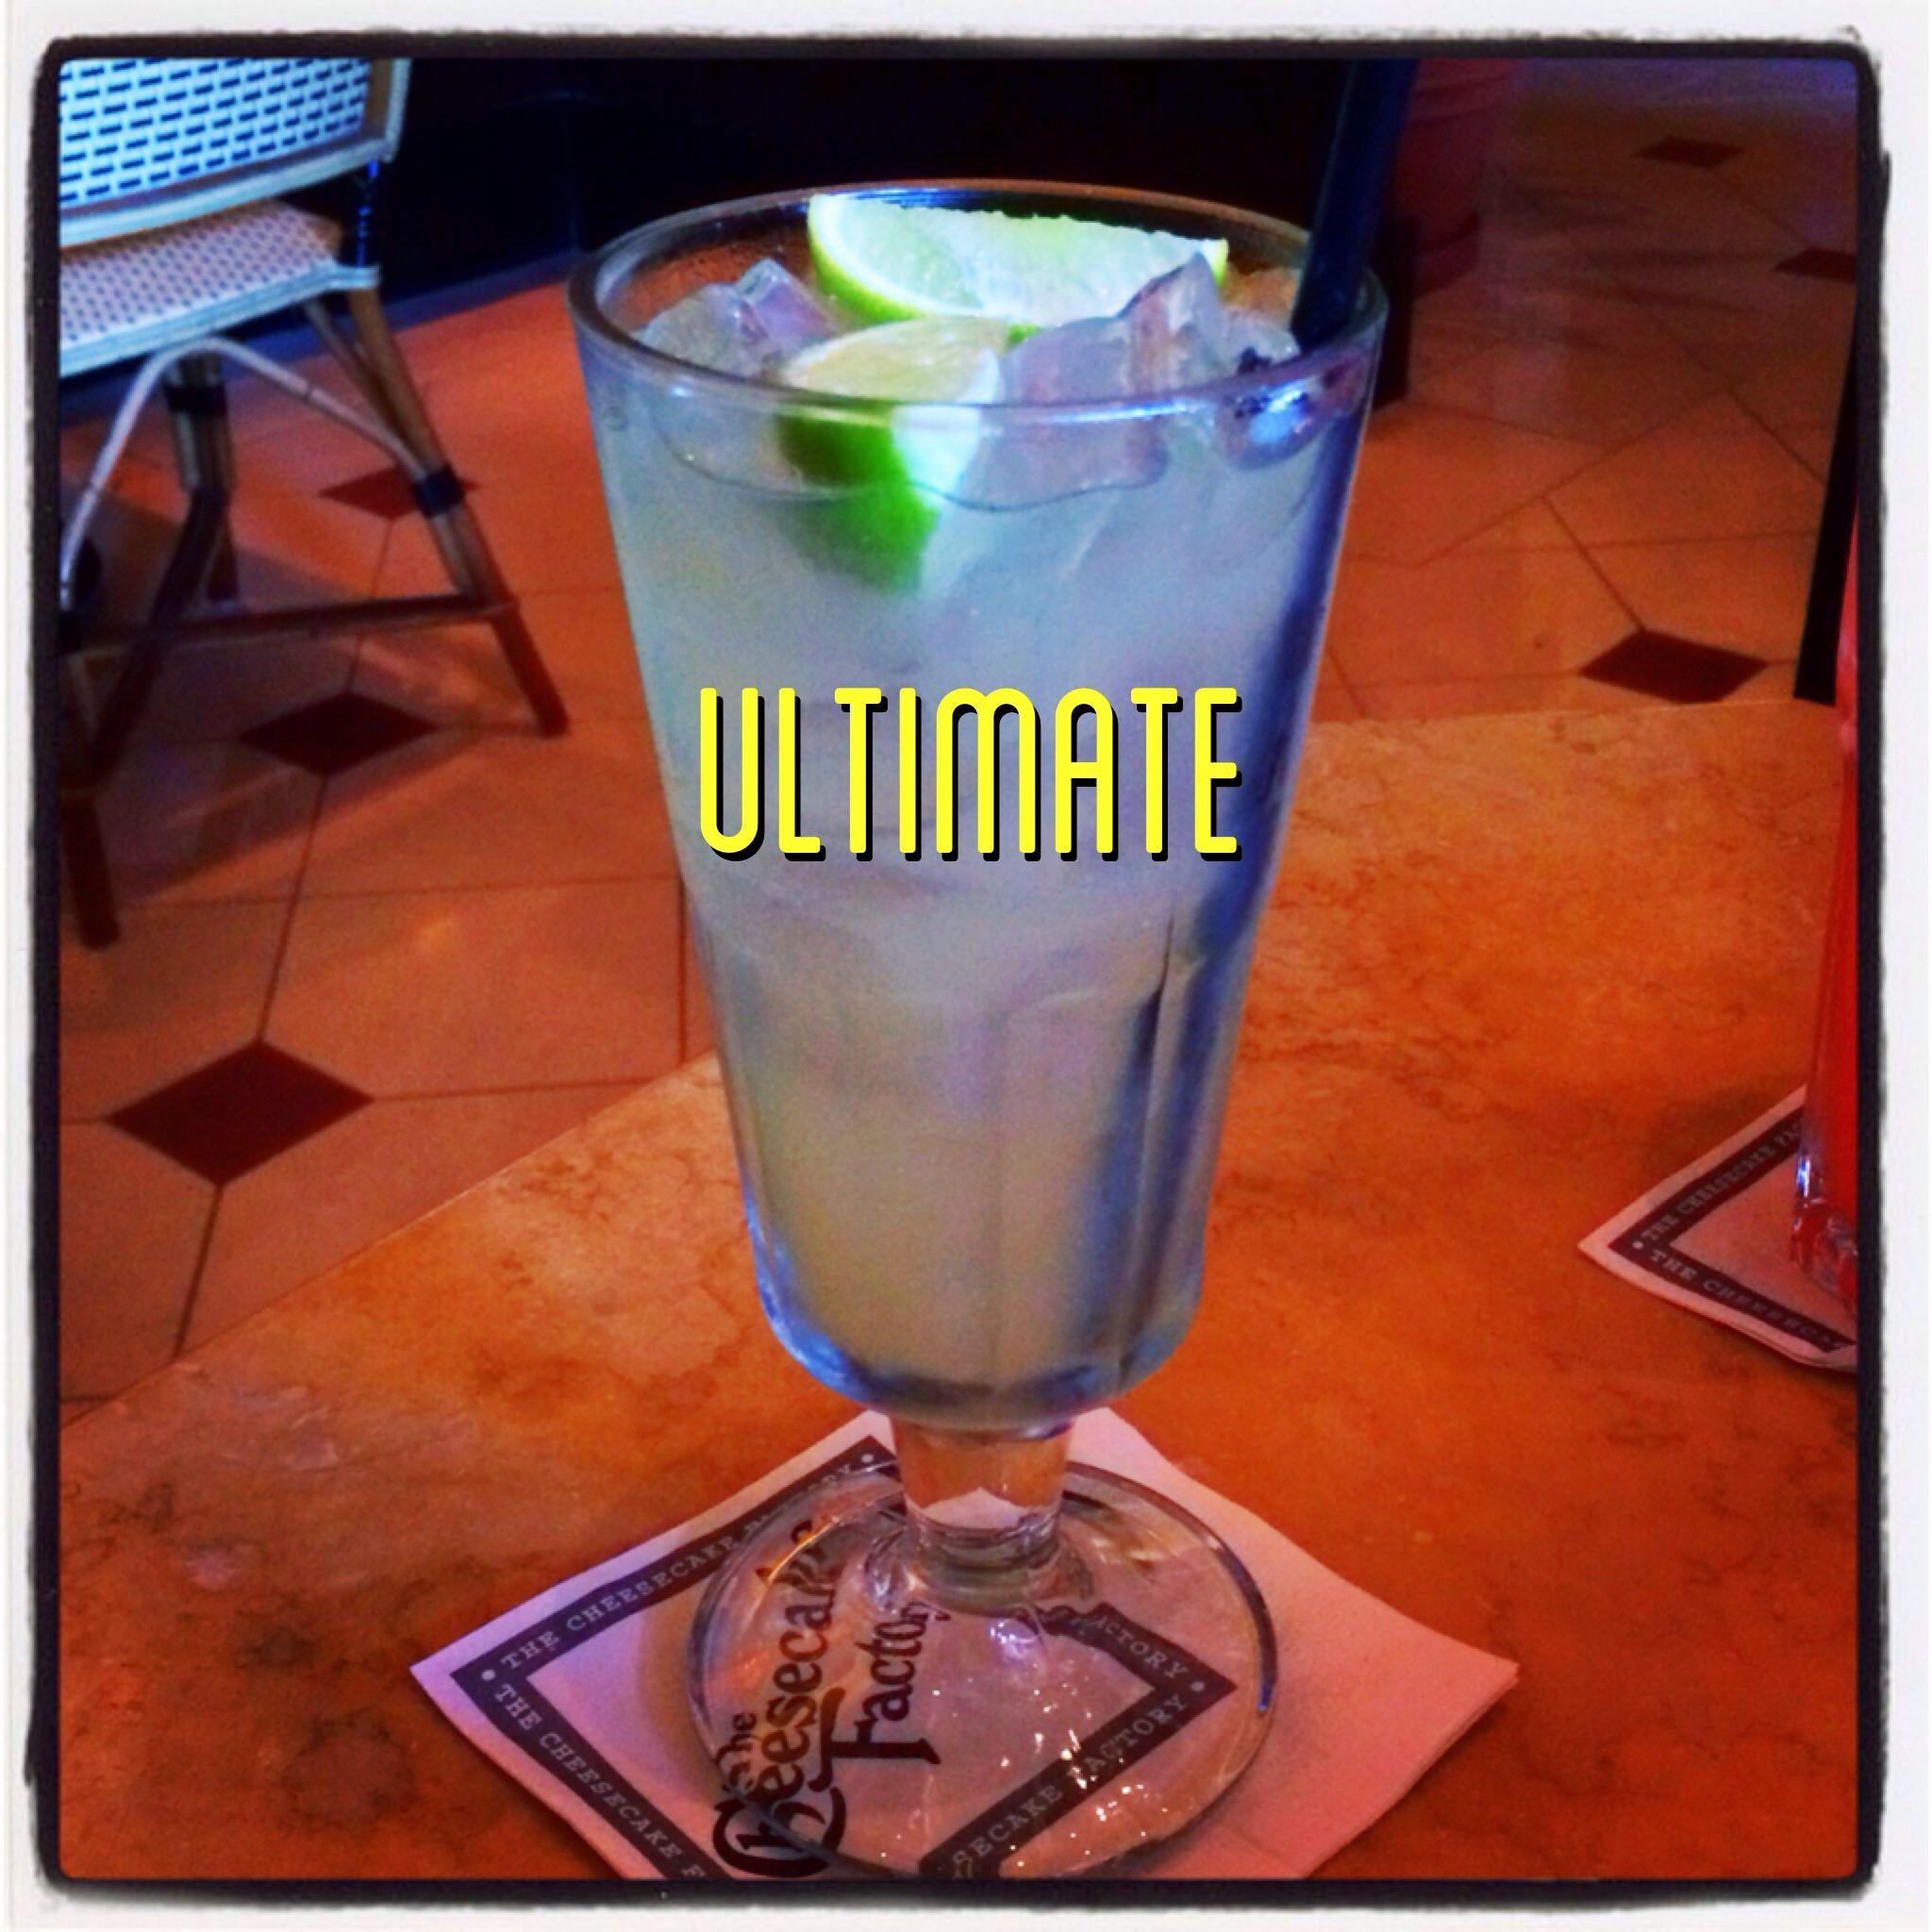 Ultimate Margarita From The Cheesecake Factory. Premium